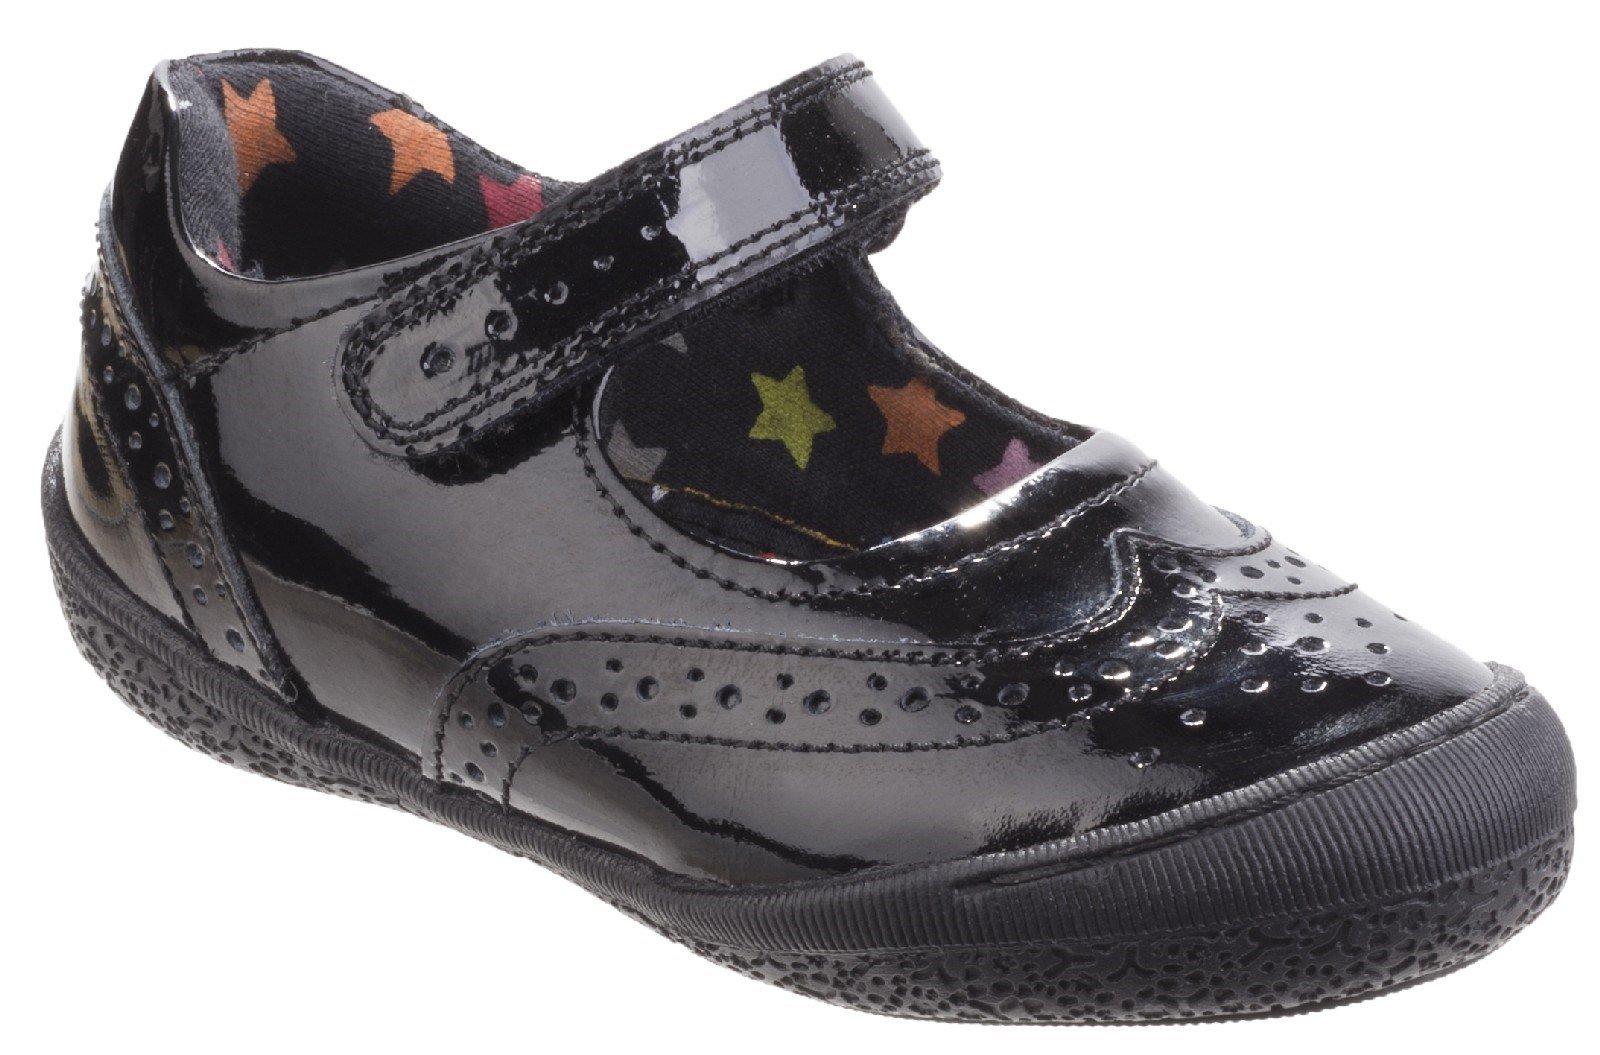 Hush Puppies Women's Rina Back To School Shoe Black 25331 - Black 6